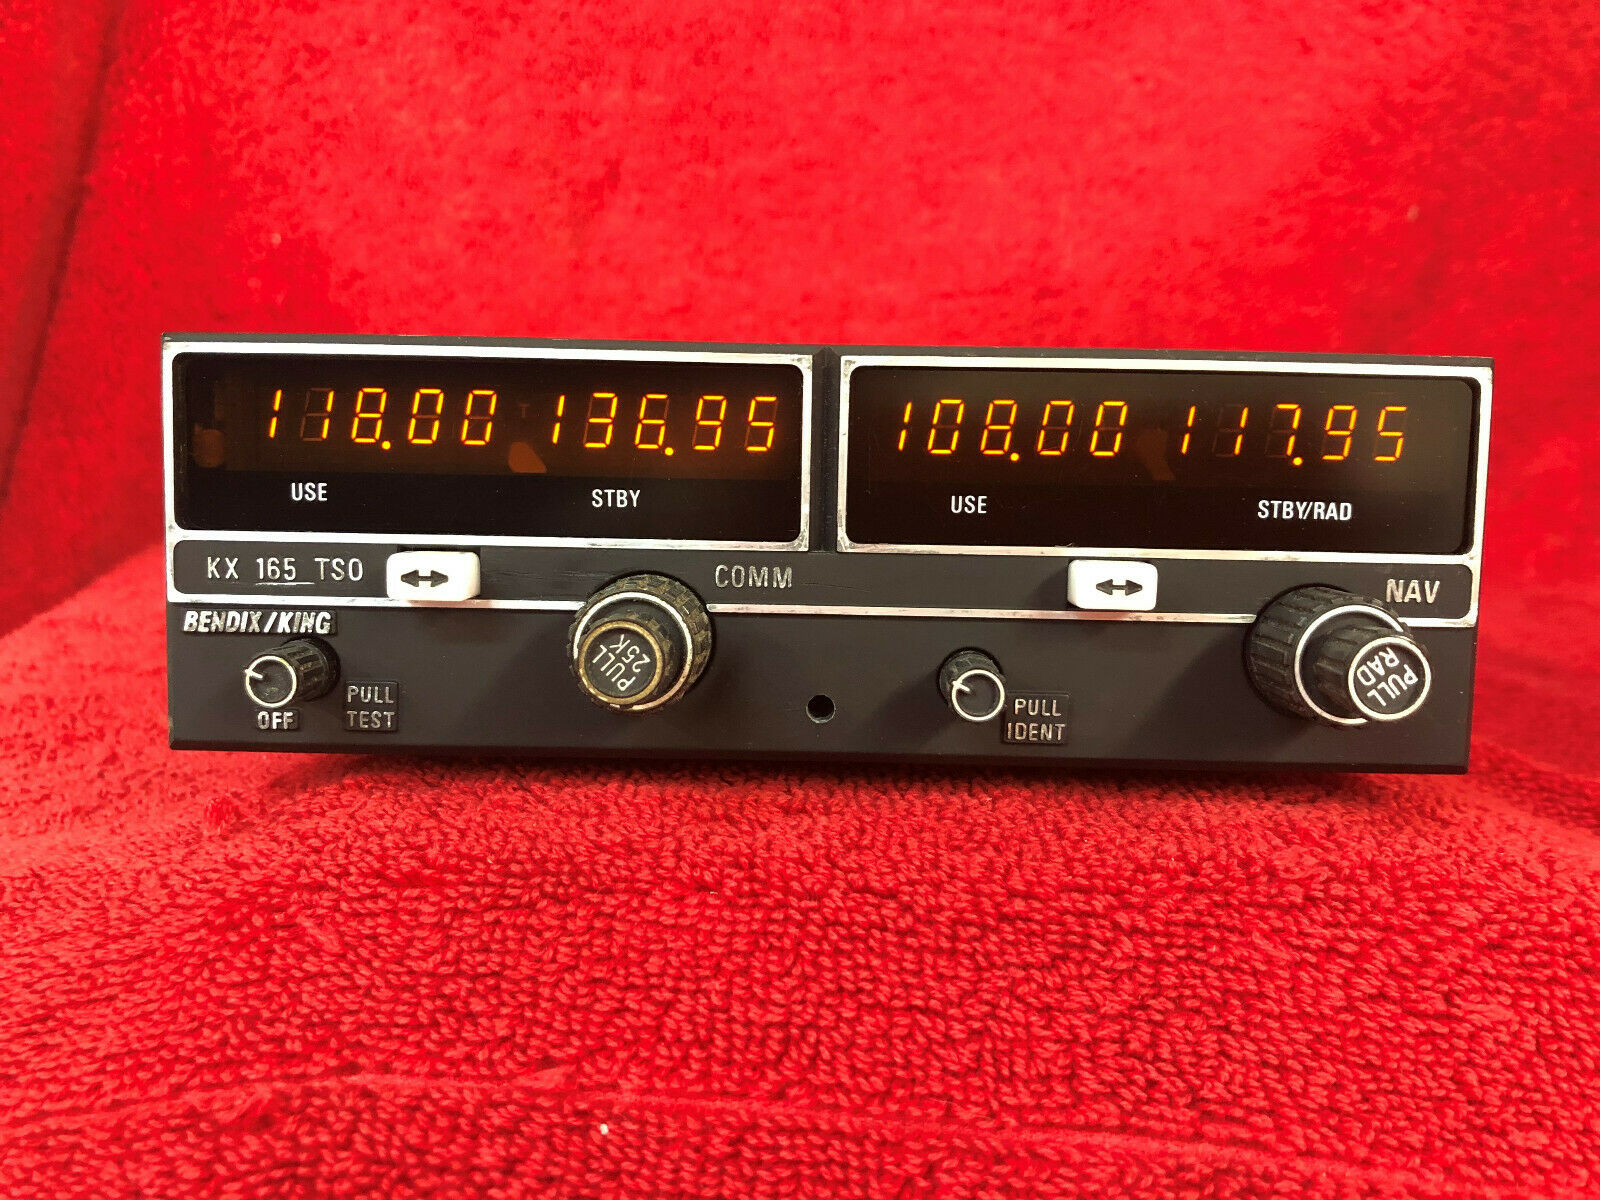 BENDIX KING KX 165 NAV/COM WITH G/S (28V) 069-1025-25 WITH FRESH FAA 8130-3 FORM